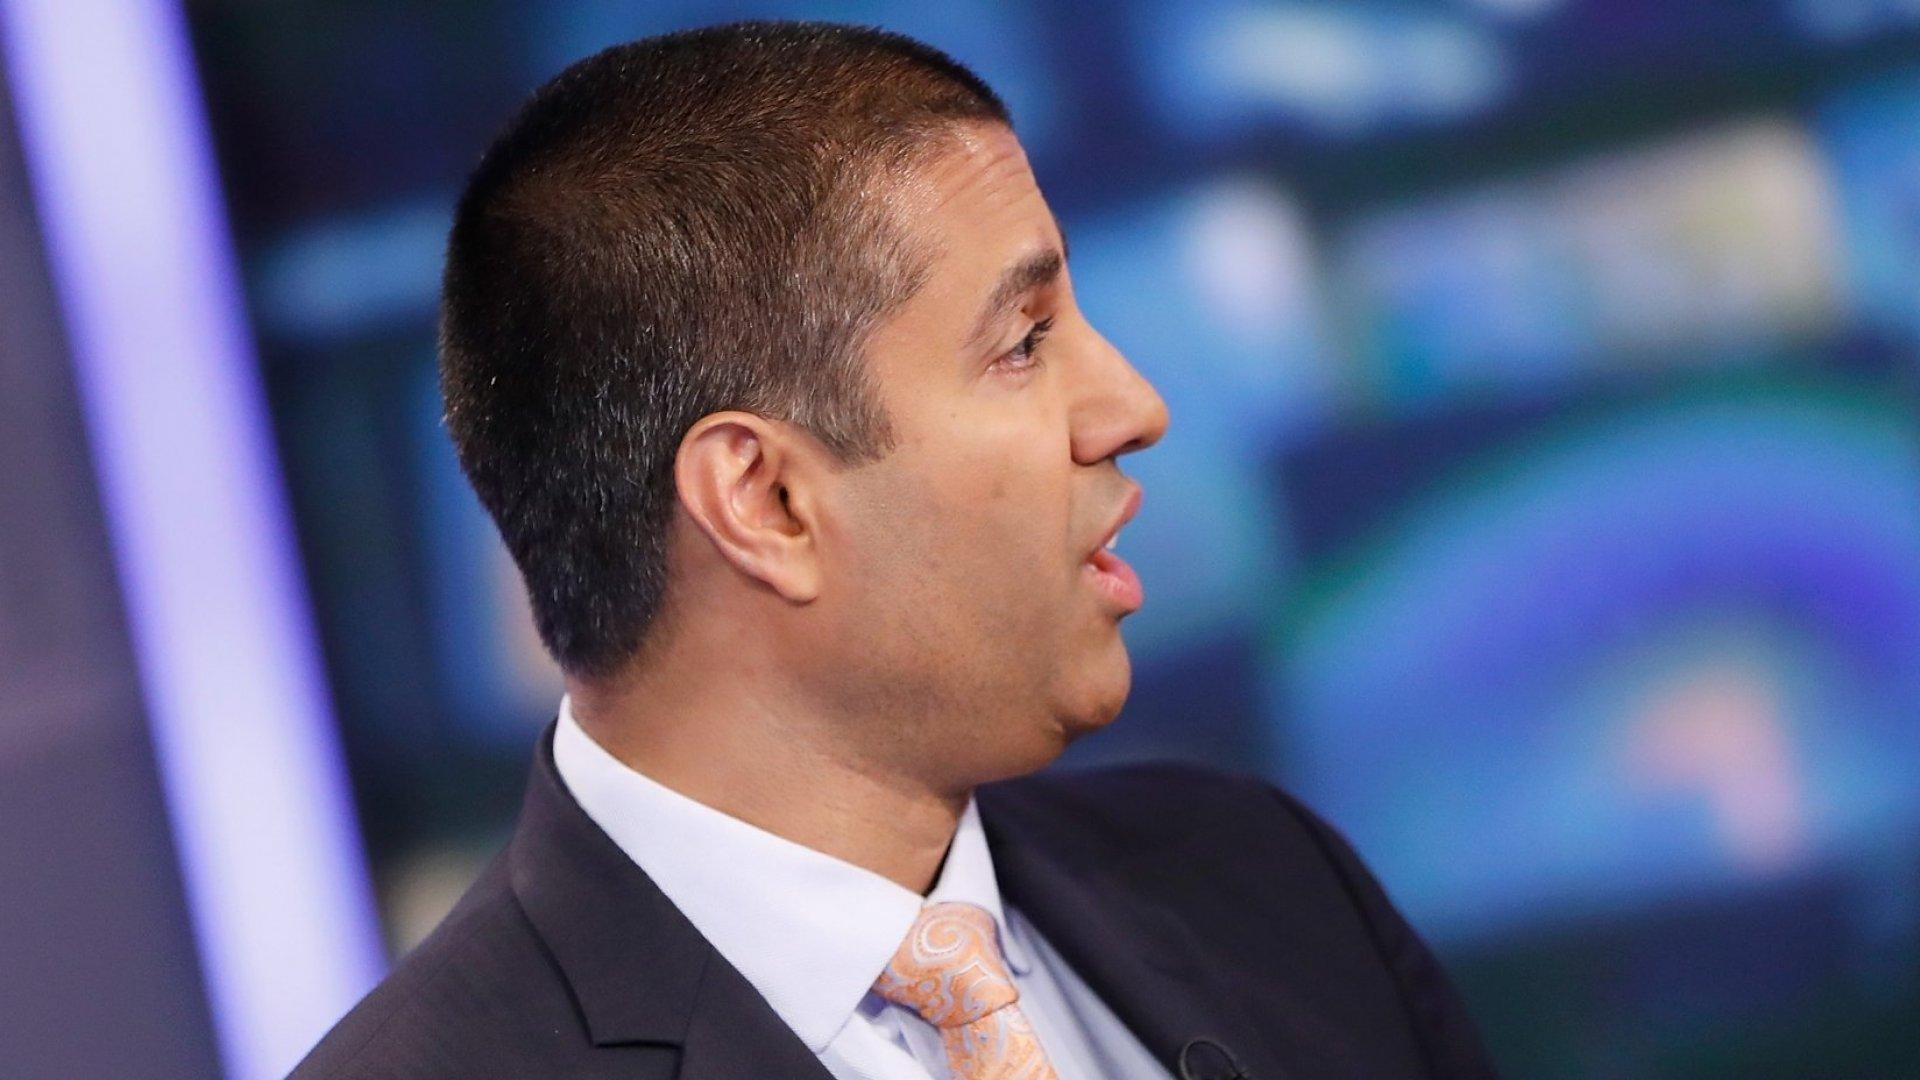 Chairman of the United States Federal Communications Commission, Ajit Varadaraj Pai.